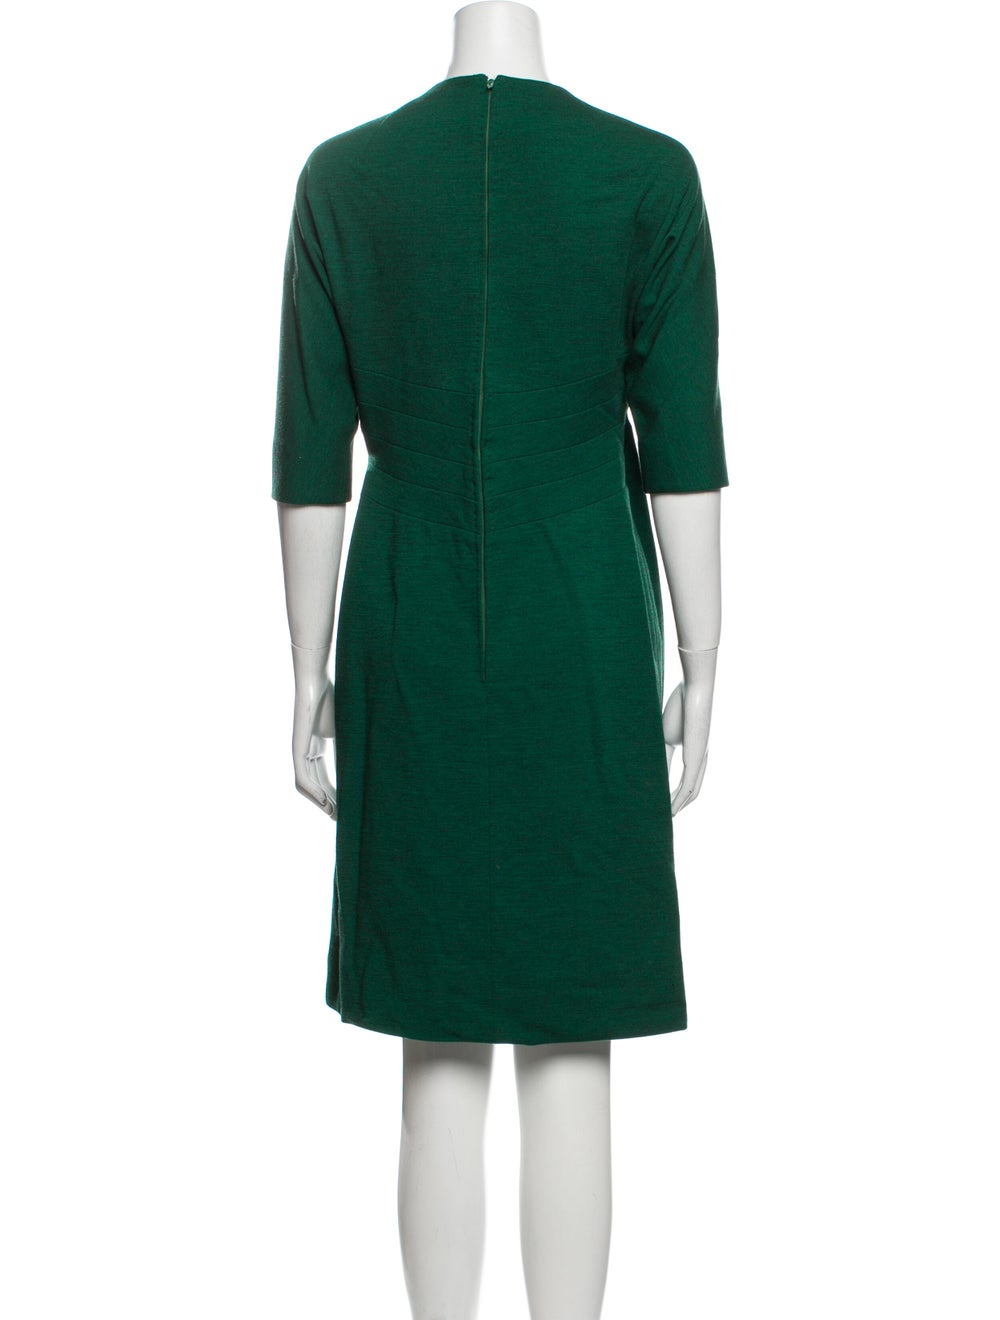 Pauline Trigere Vintage Knee-Length Dress Green - image 3